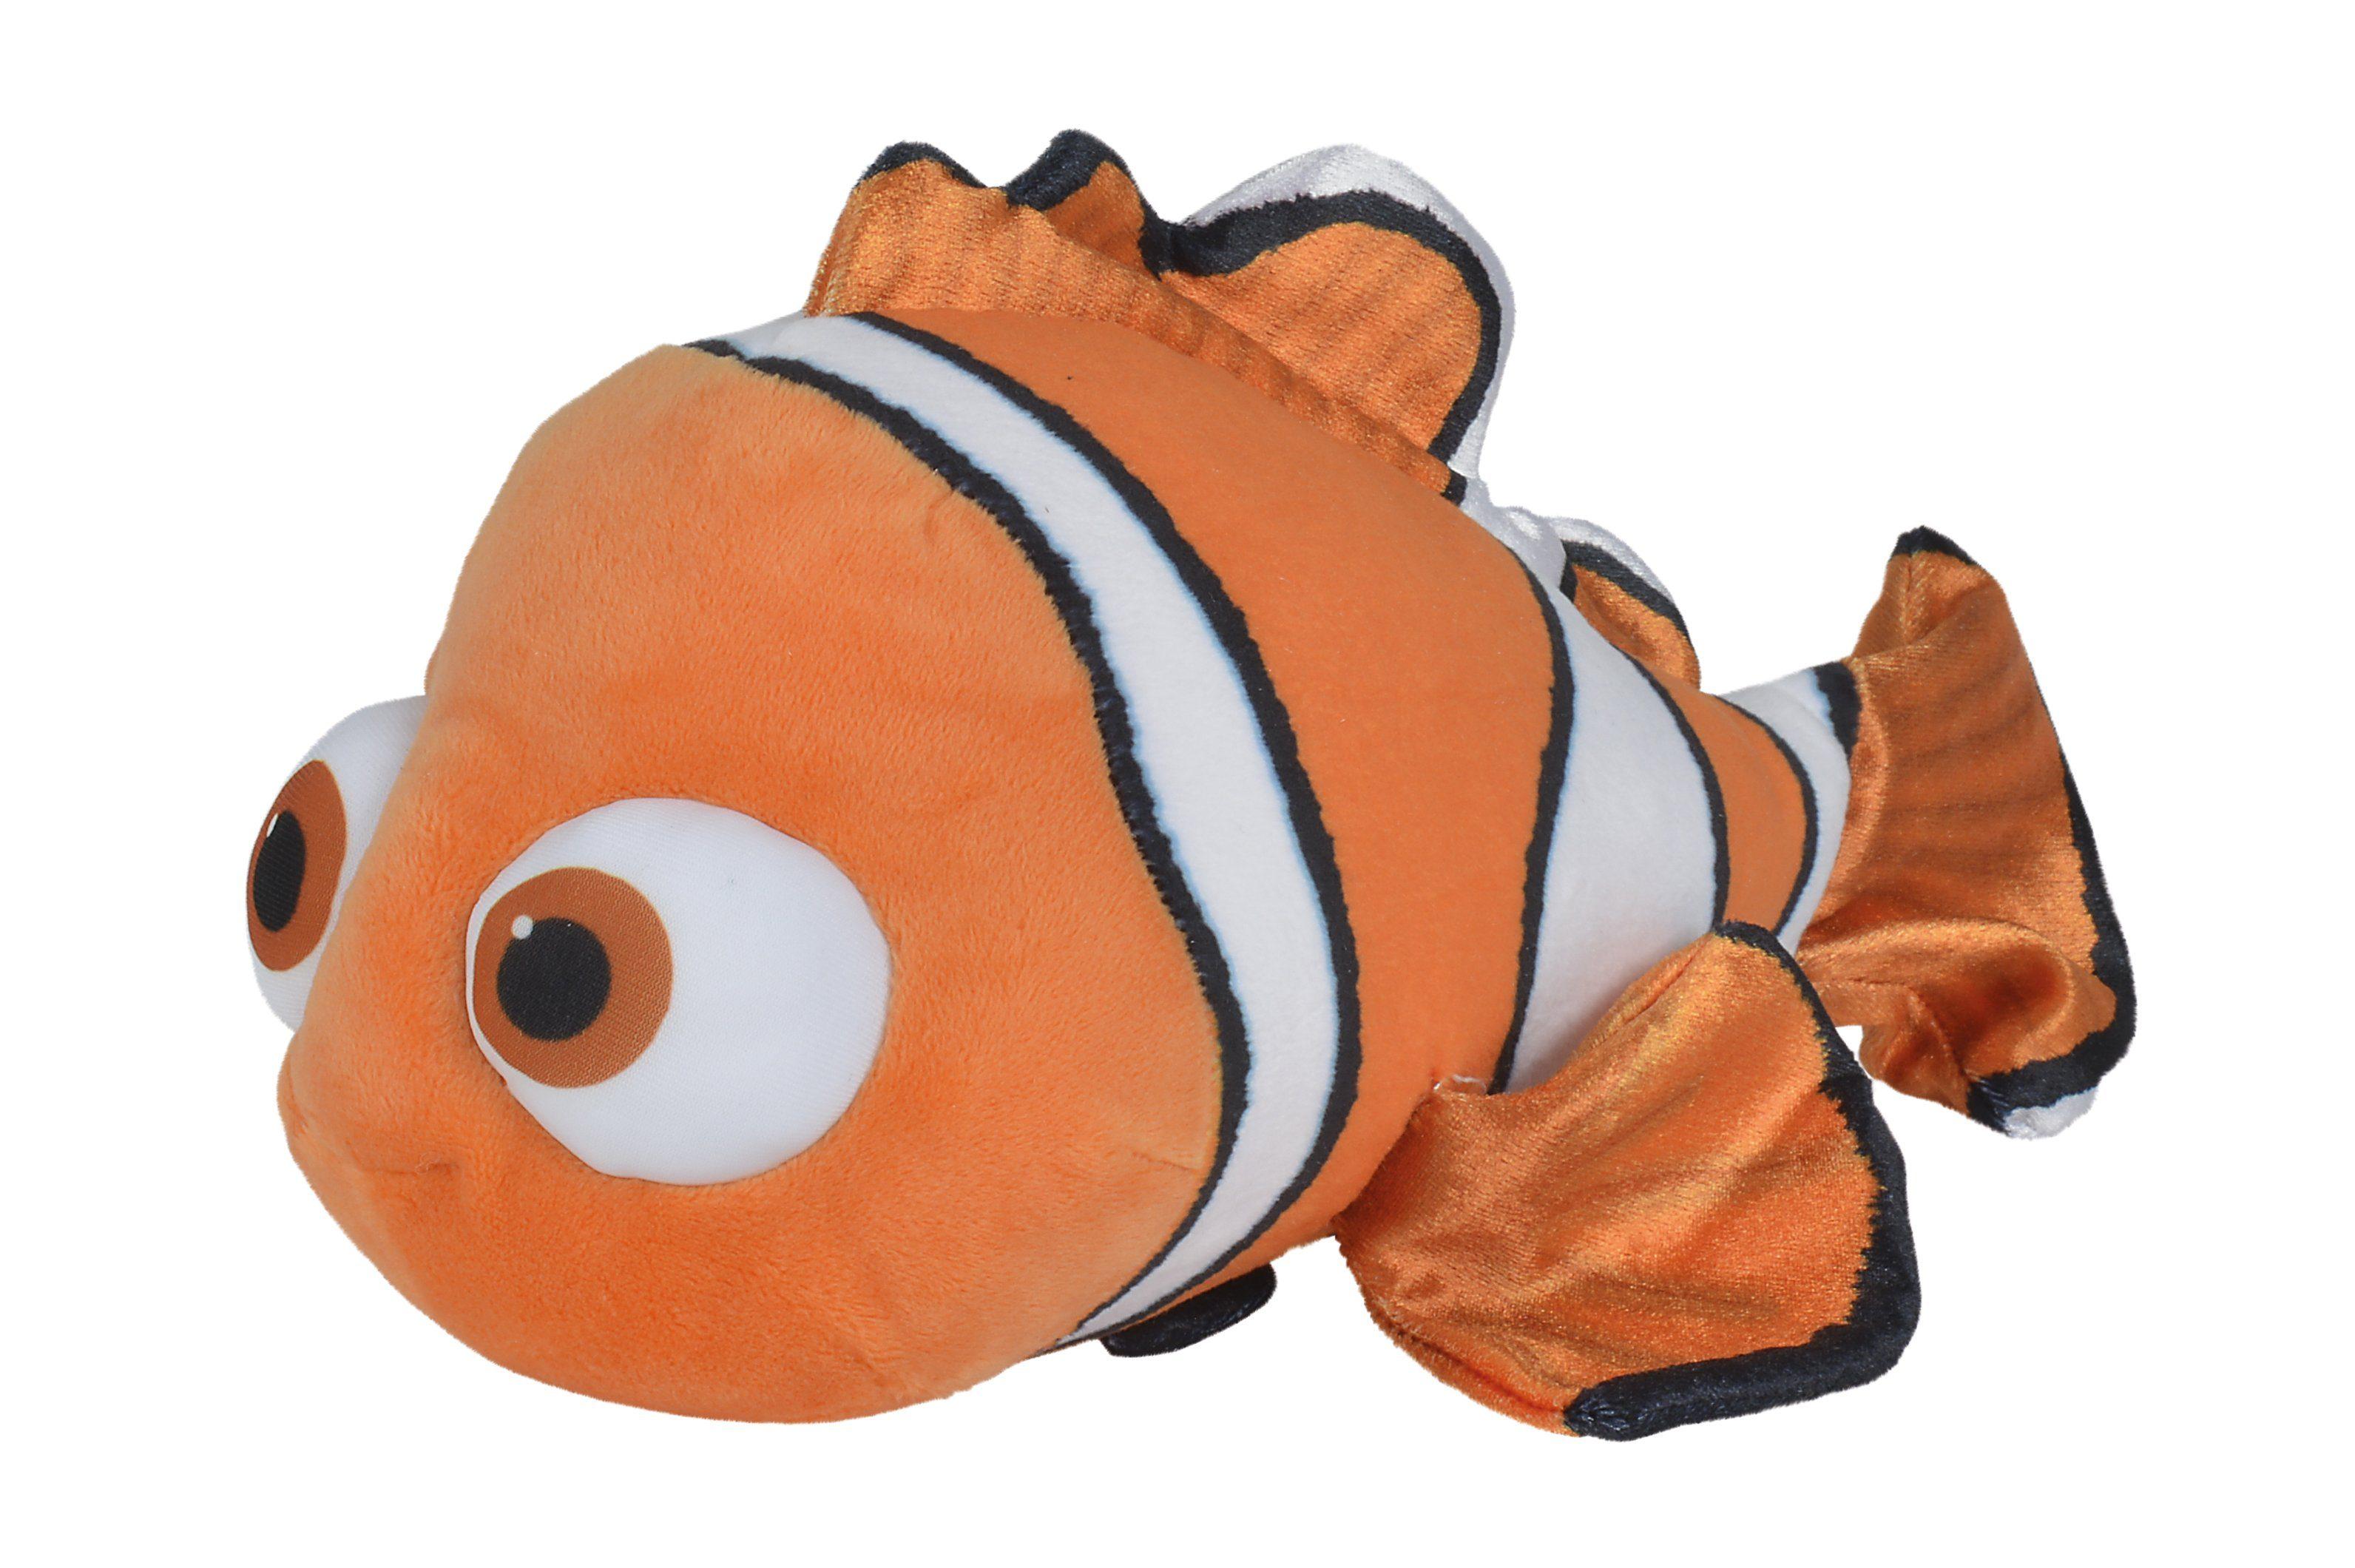 Simba Plüschtier Clownfisch, »Disney Finding Dory, Nemo ca. 50 cm«